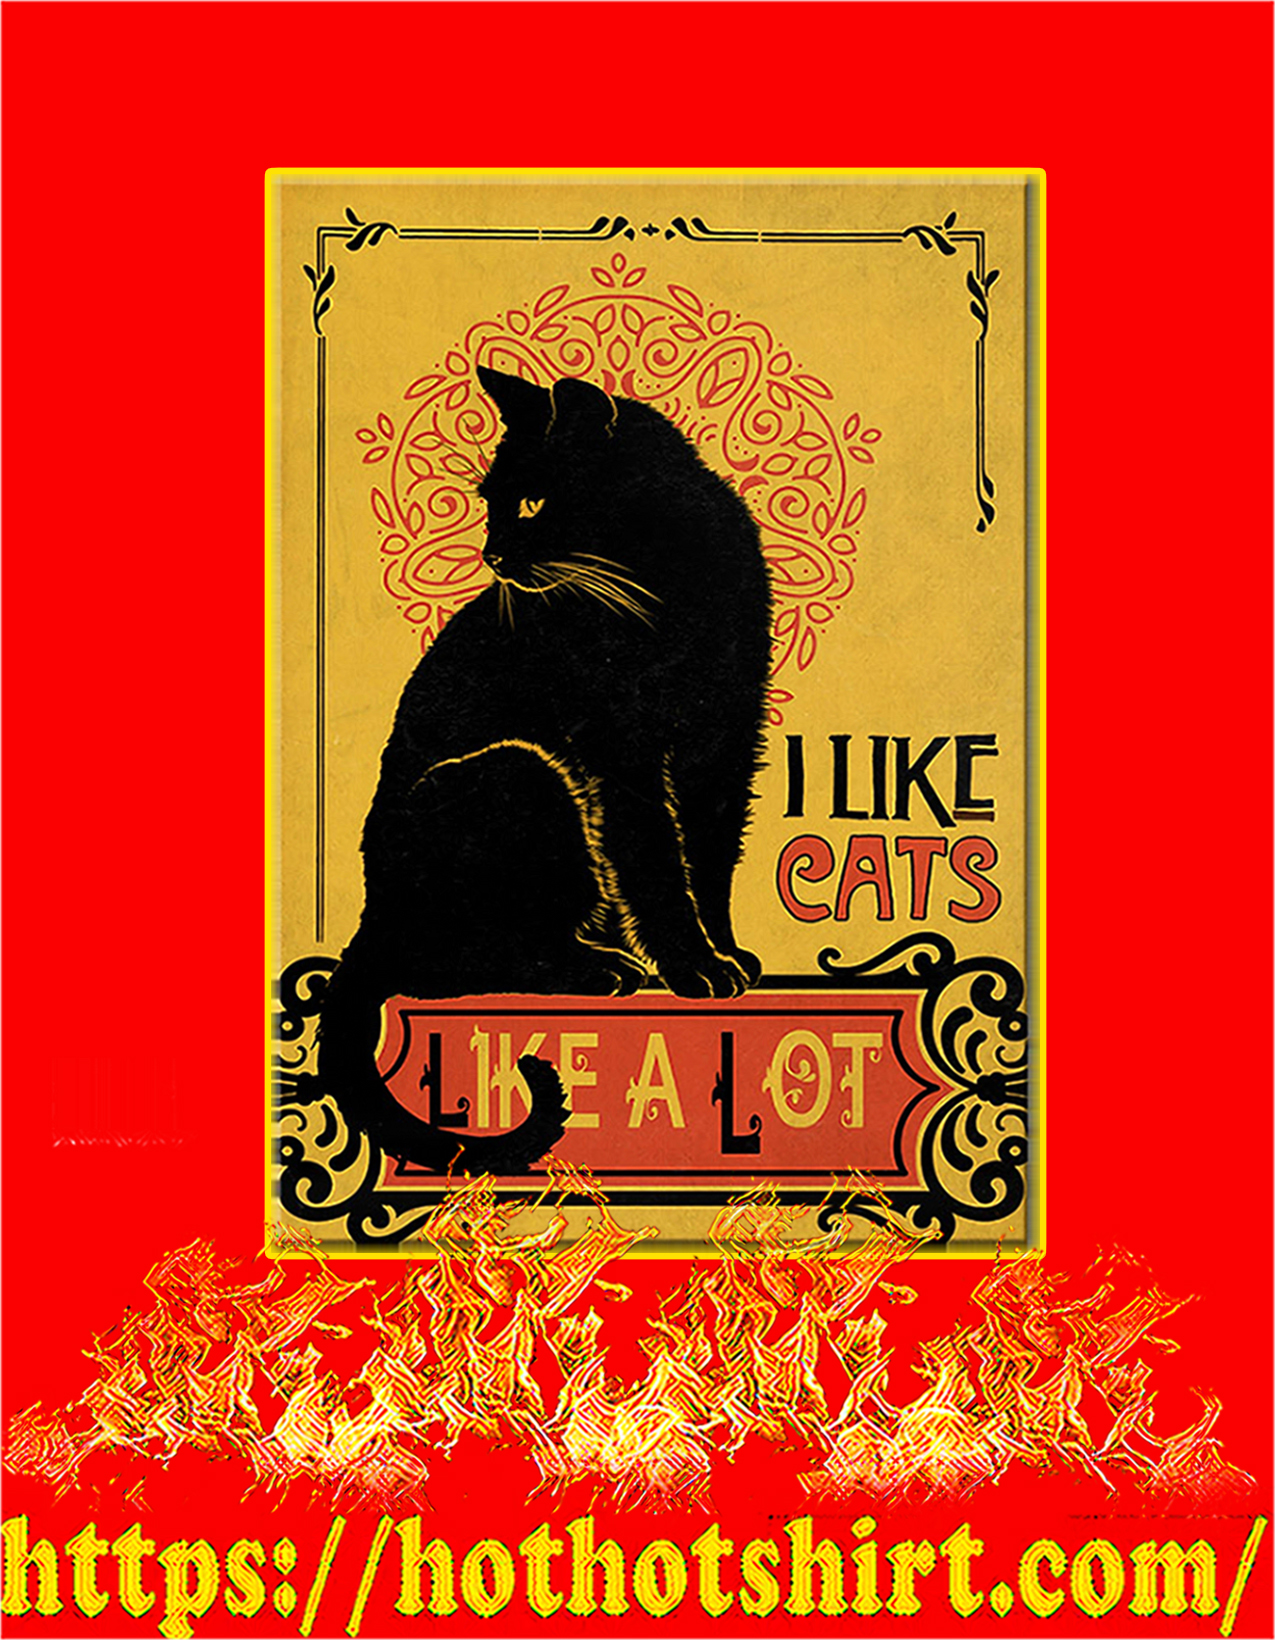 Black cat I like cats like a lot poster - A2